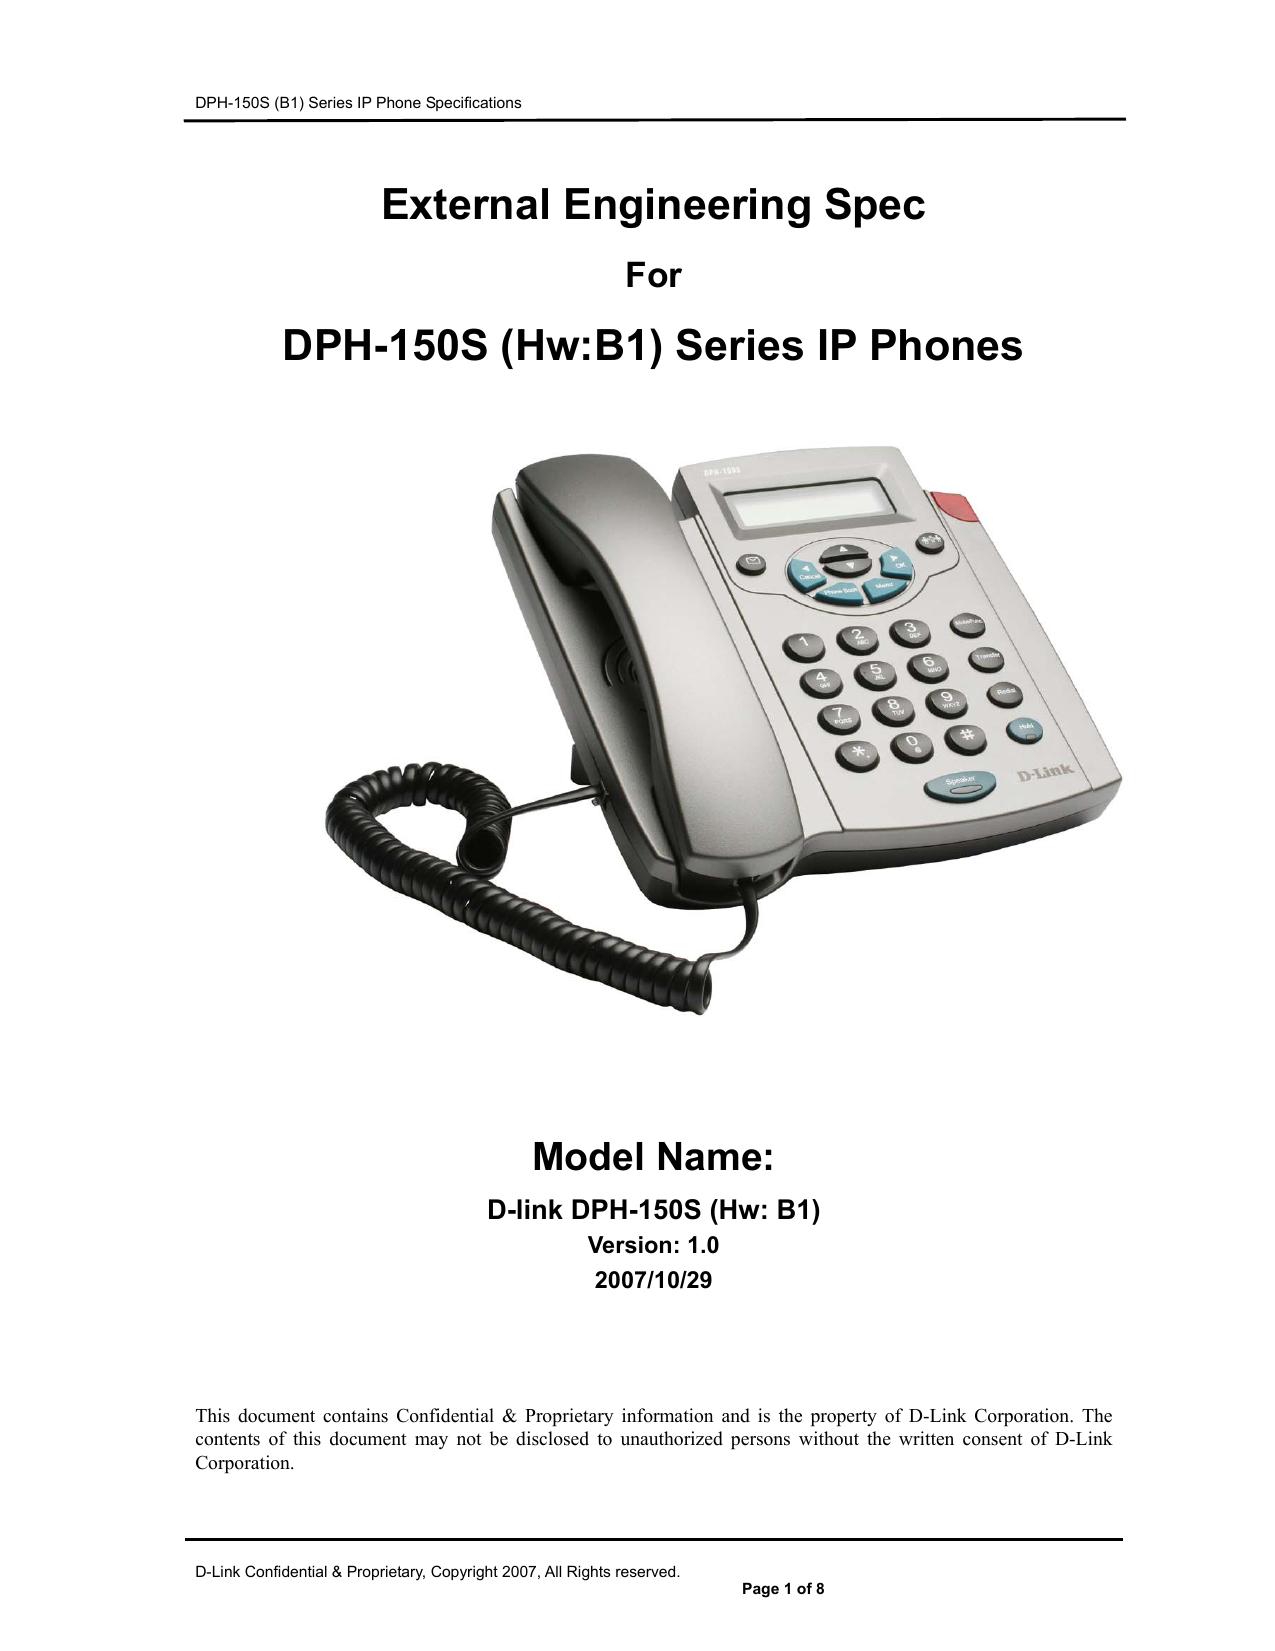 External Engineering Spec DPH-150S (Hw:B1) Series IP Phones | manualzz.com